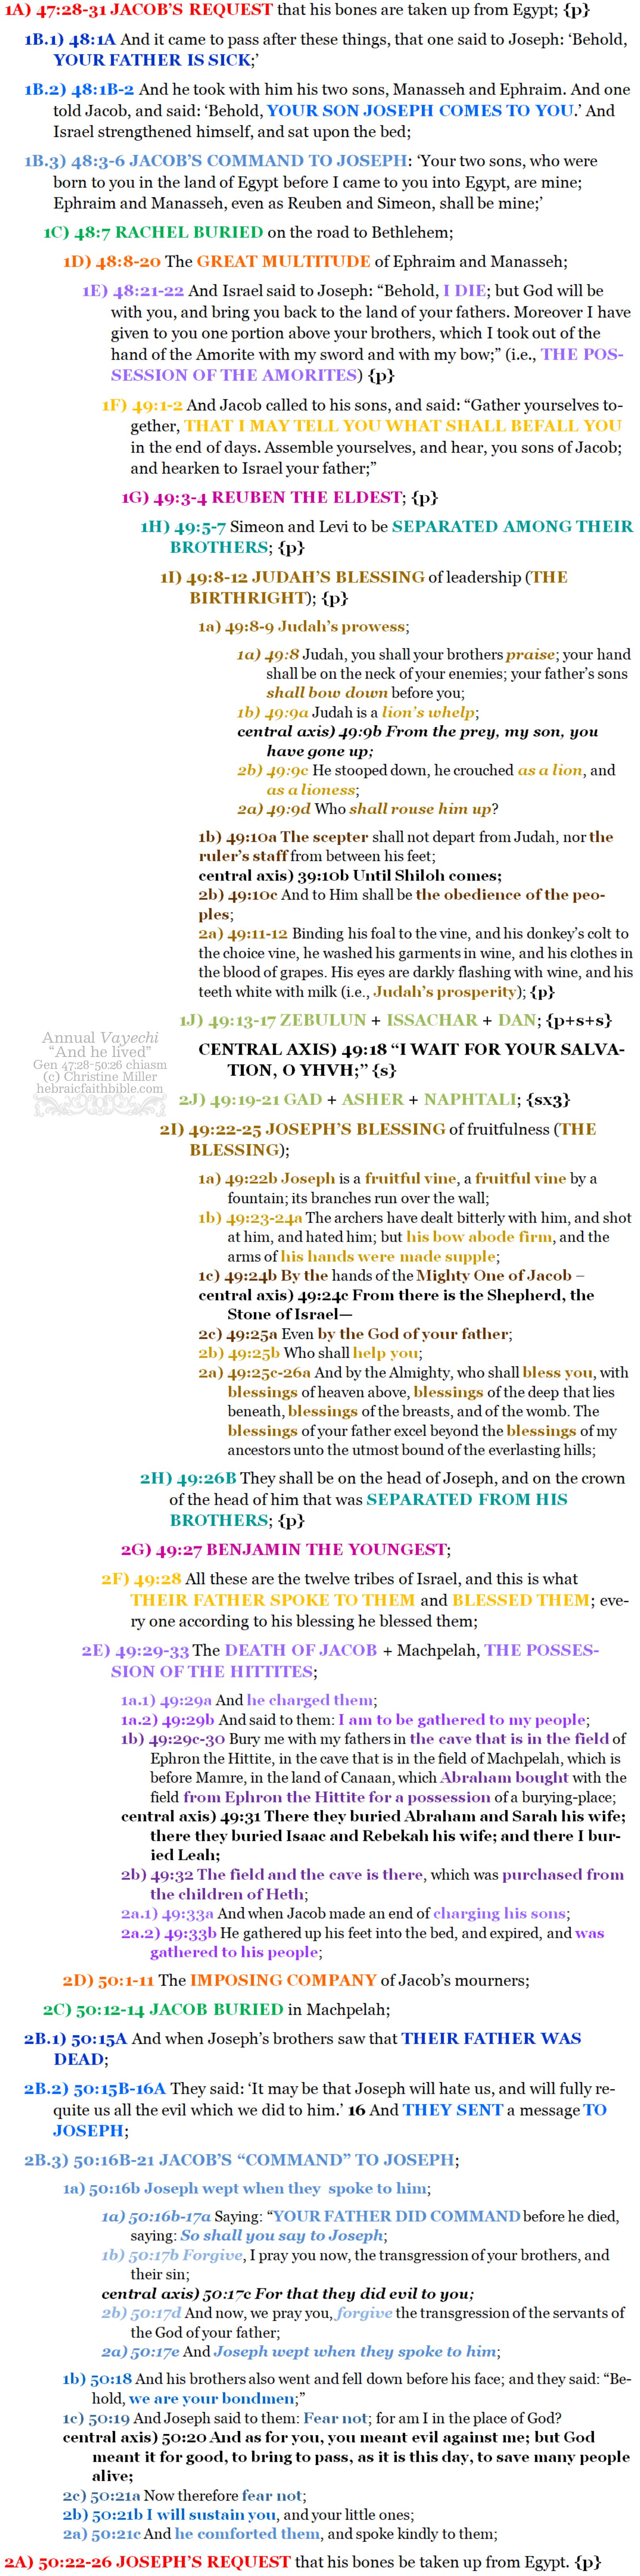 Gen 47:28-50:26 chiasm vayechi | hebraicfaithbible.com